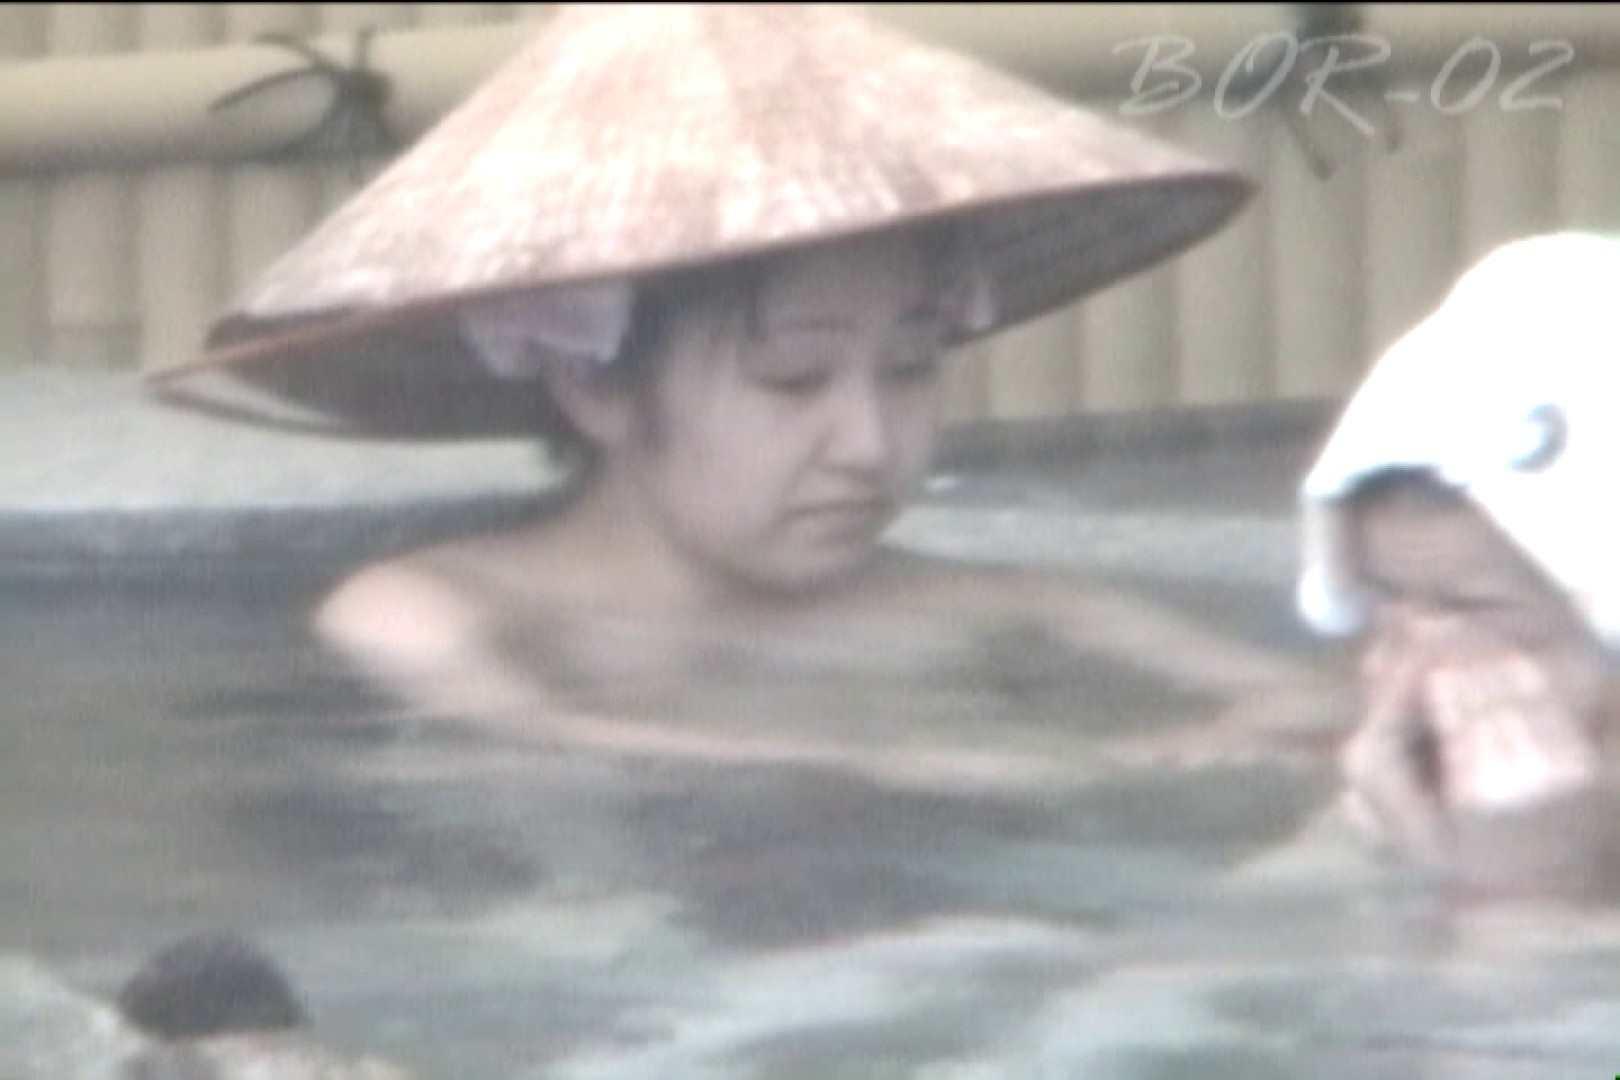 Aquaな露天風呂Vol.475 盗撮師作品  87pic 81